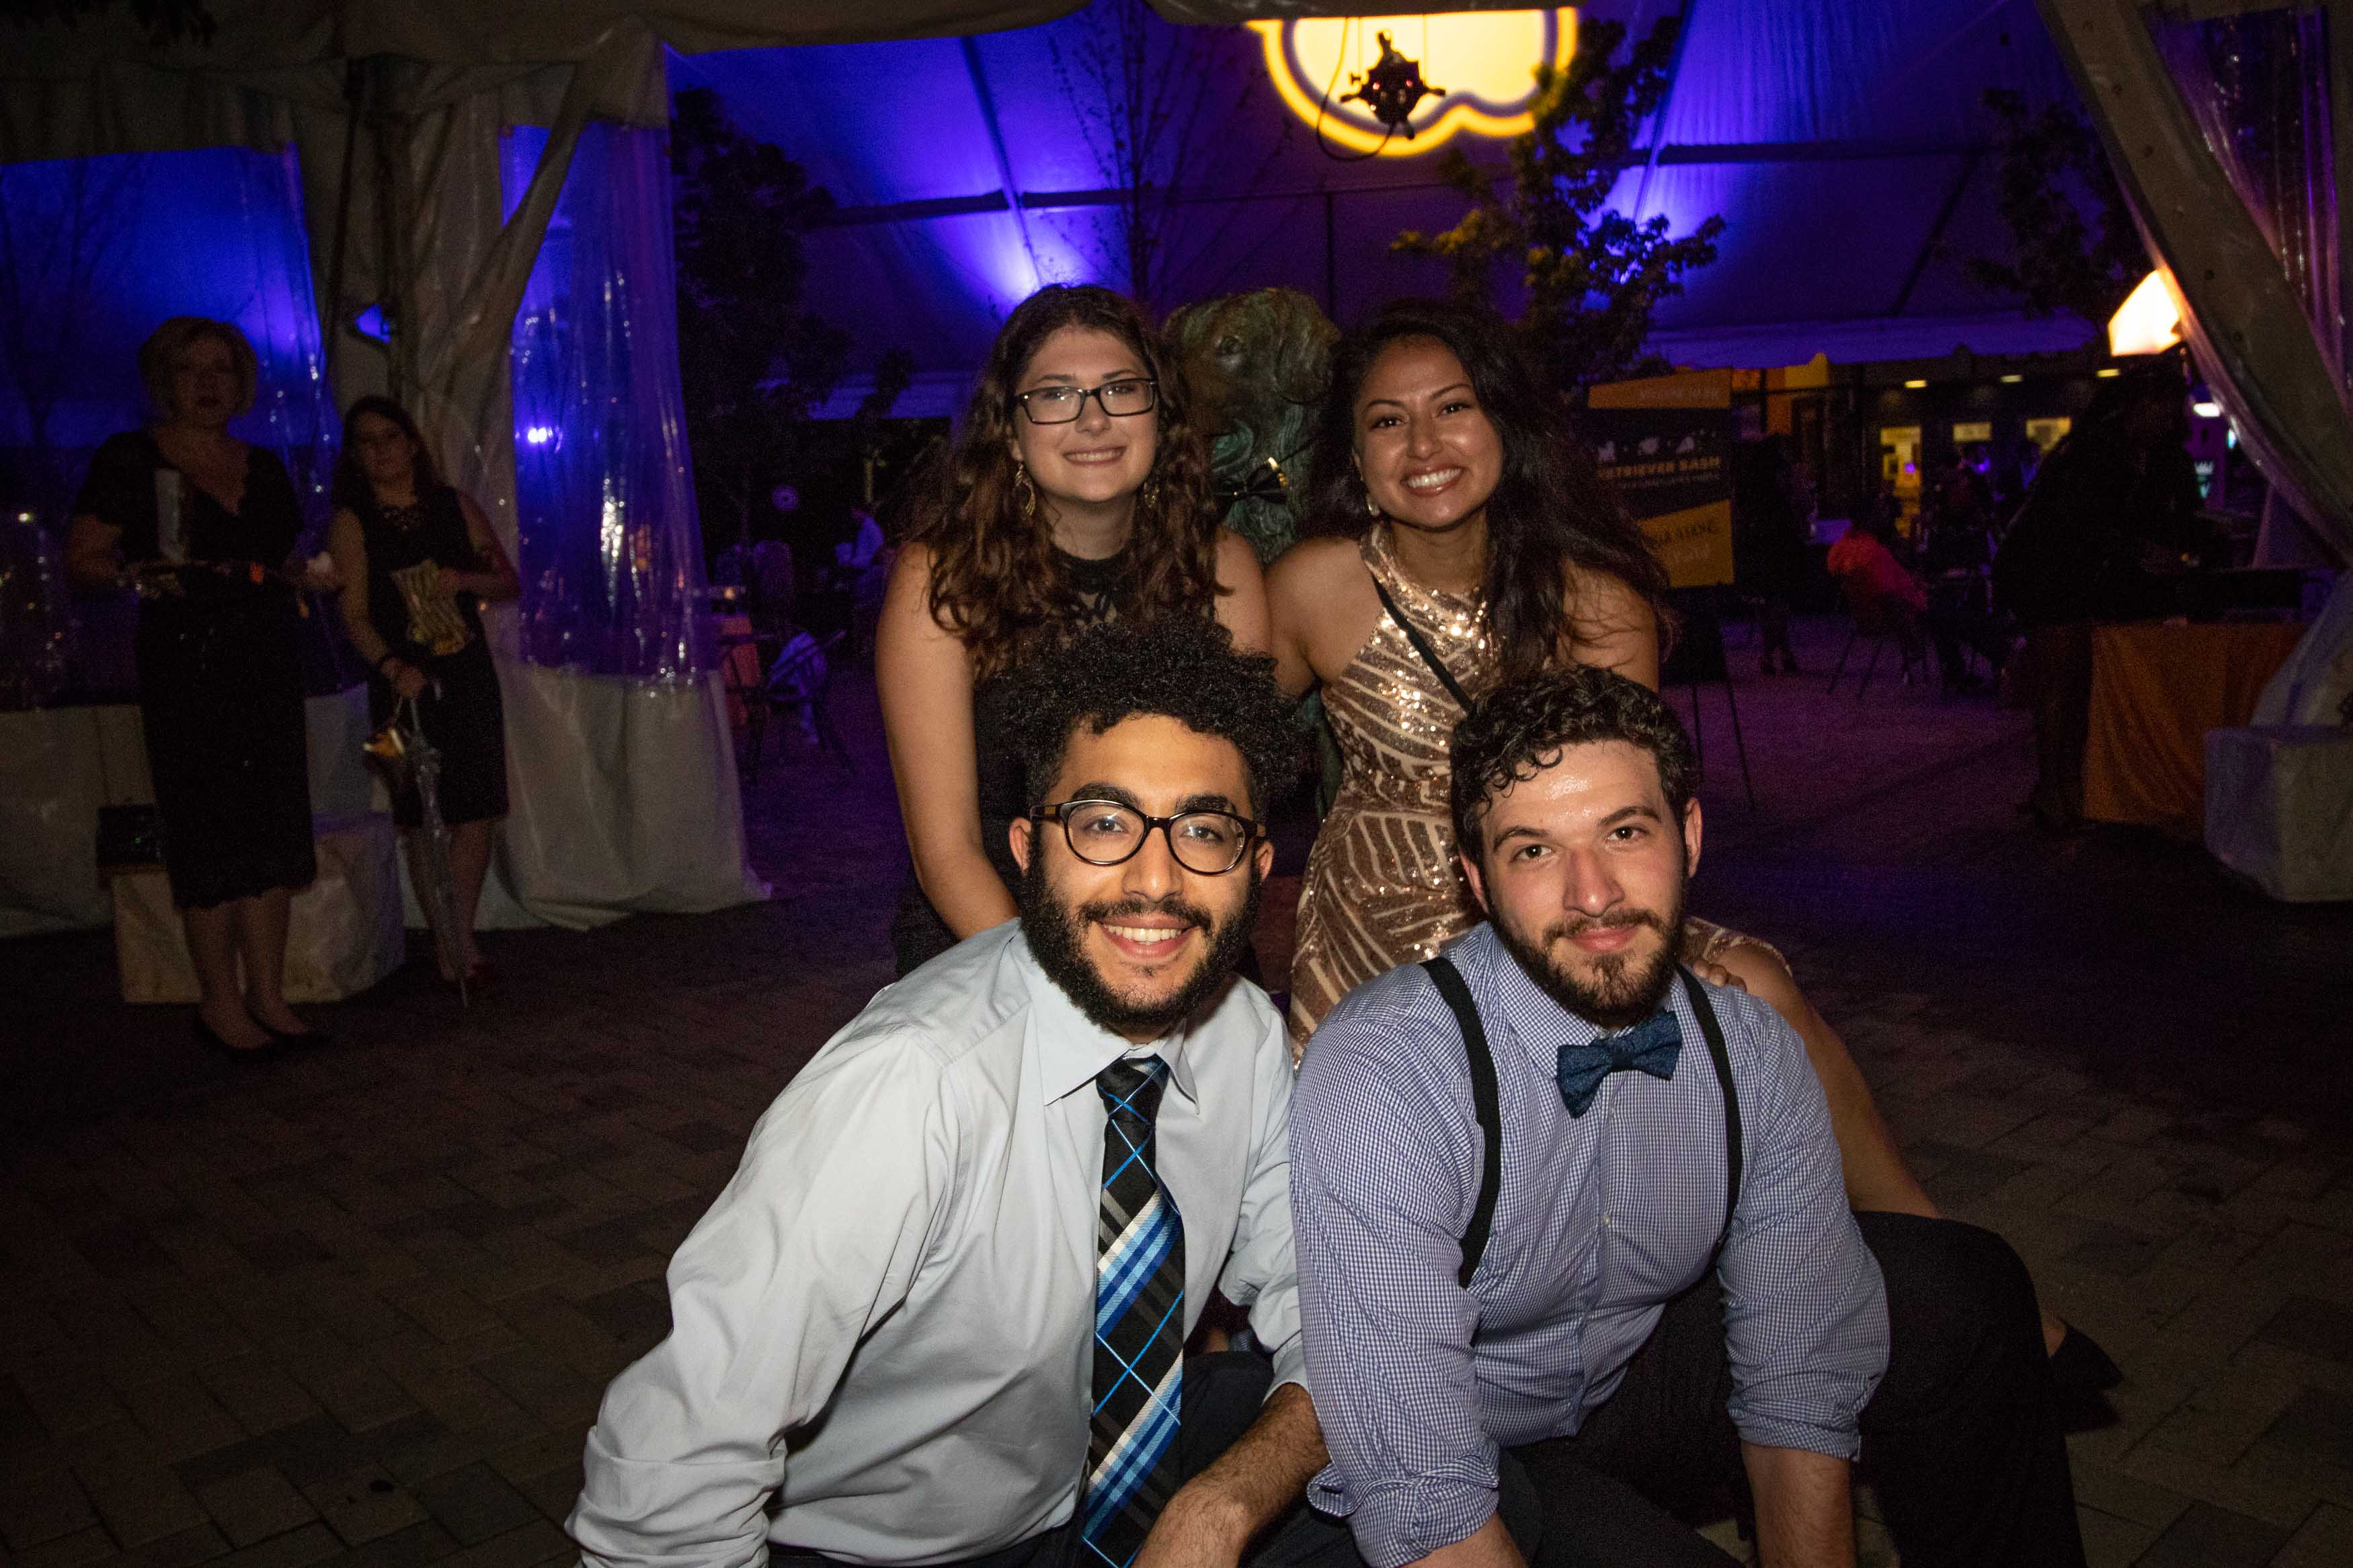 Four grads dressed up for Grad dance